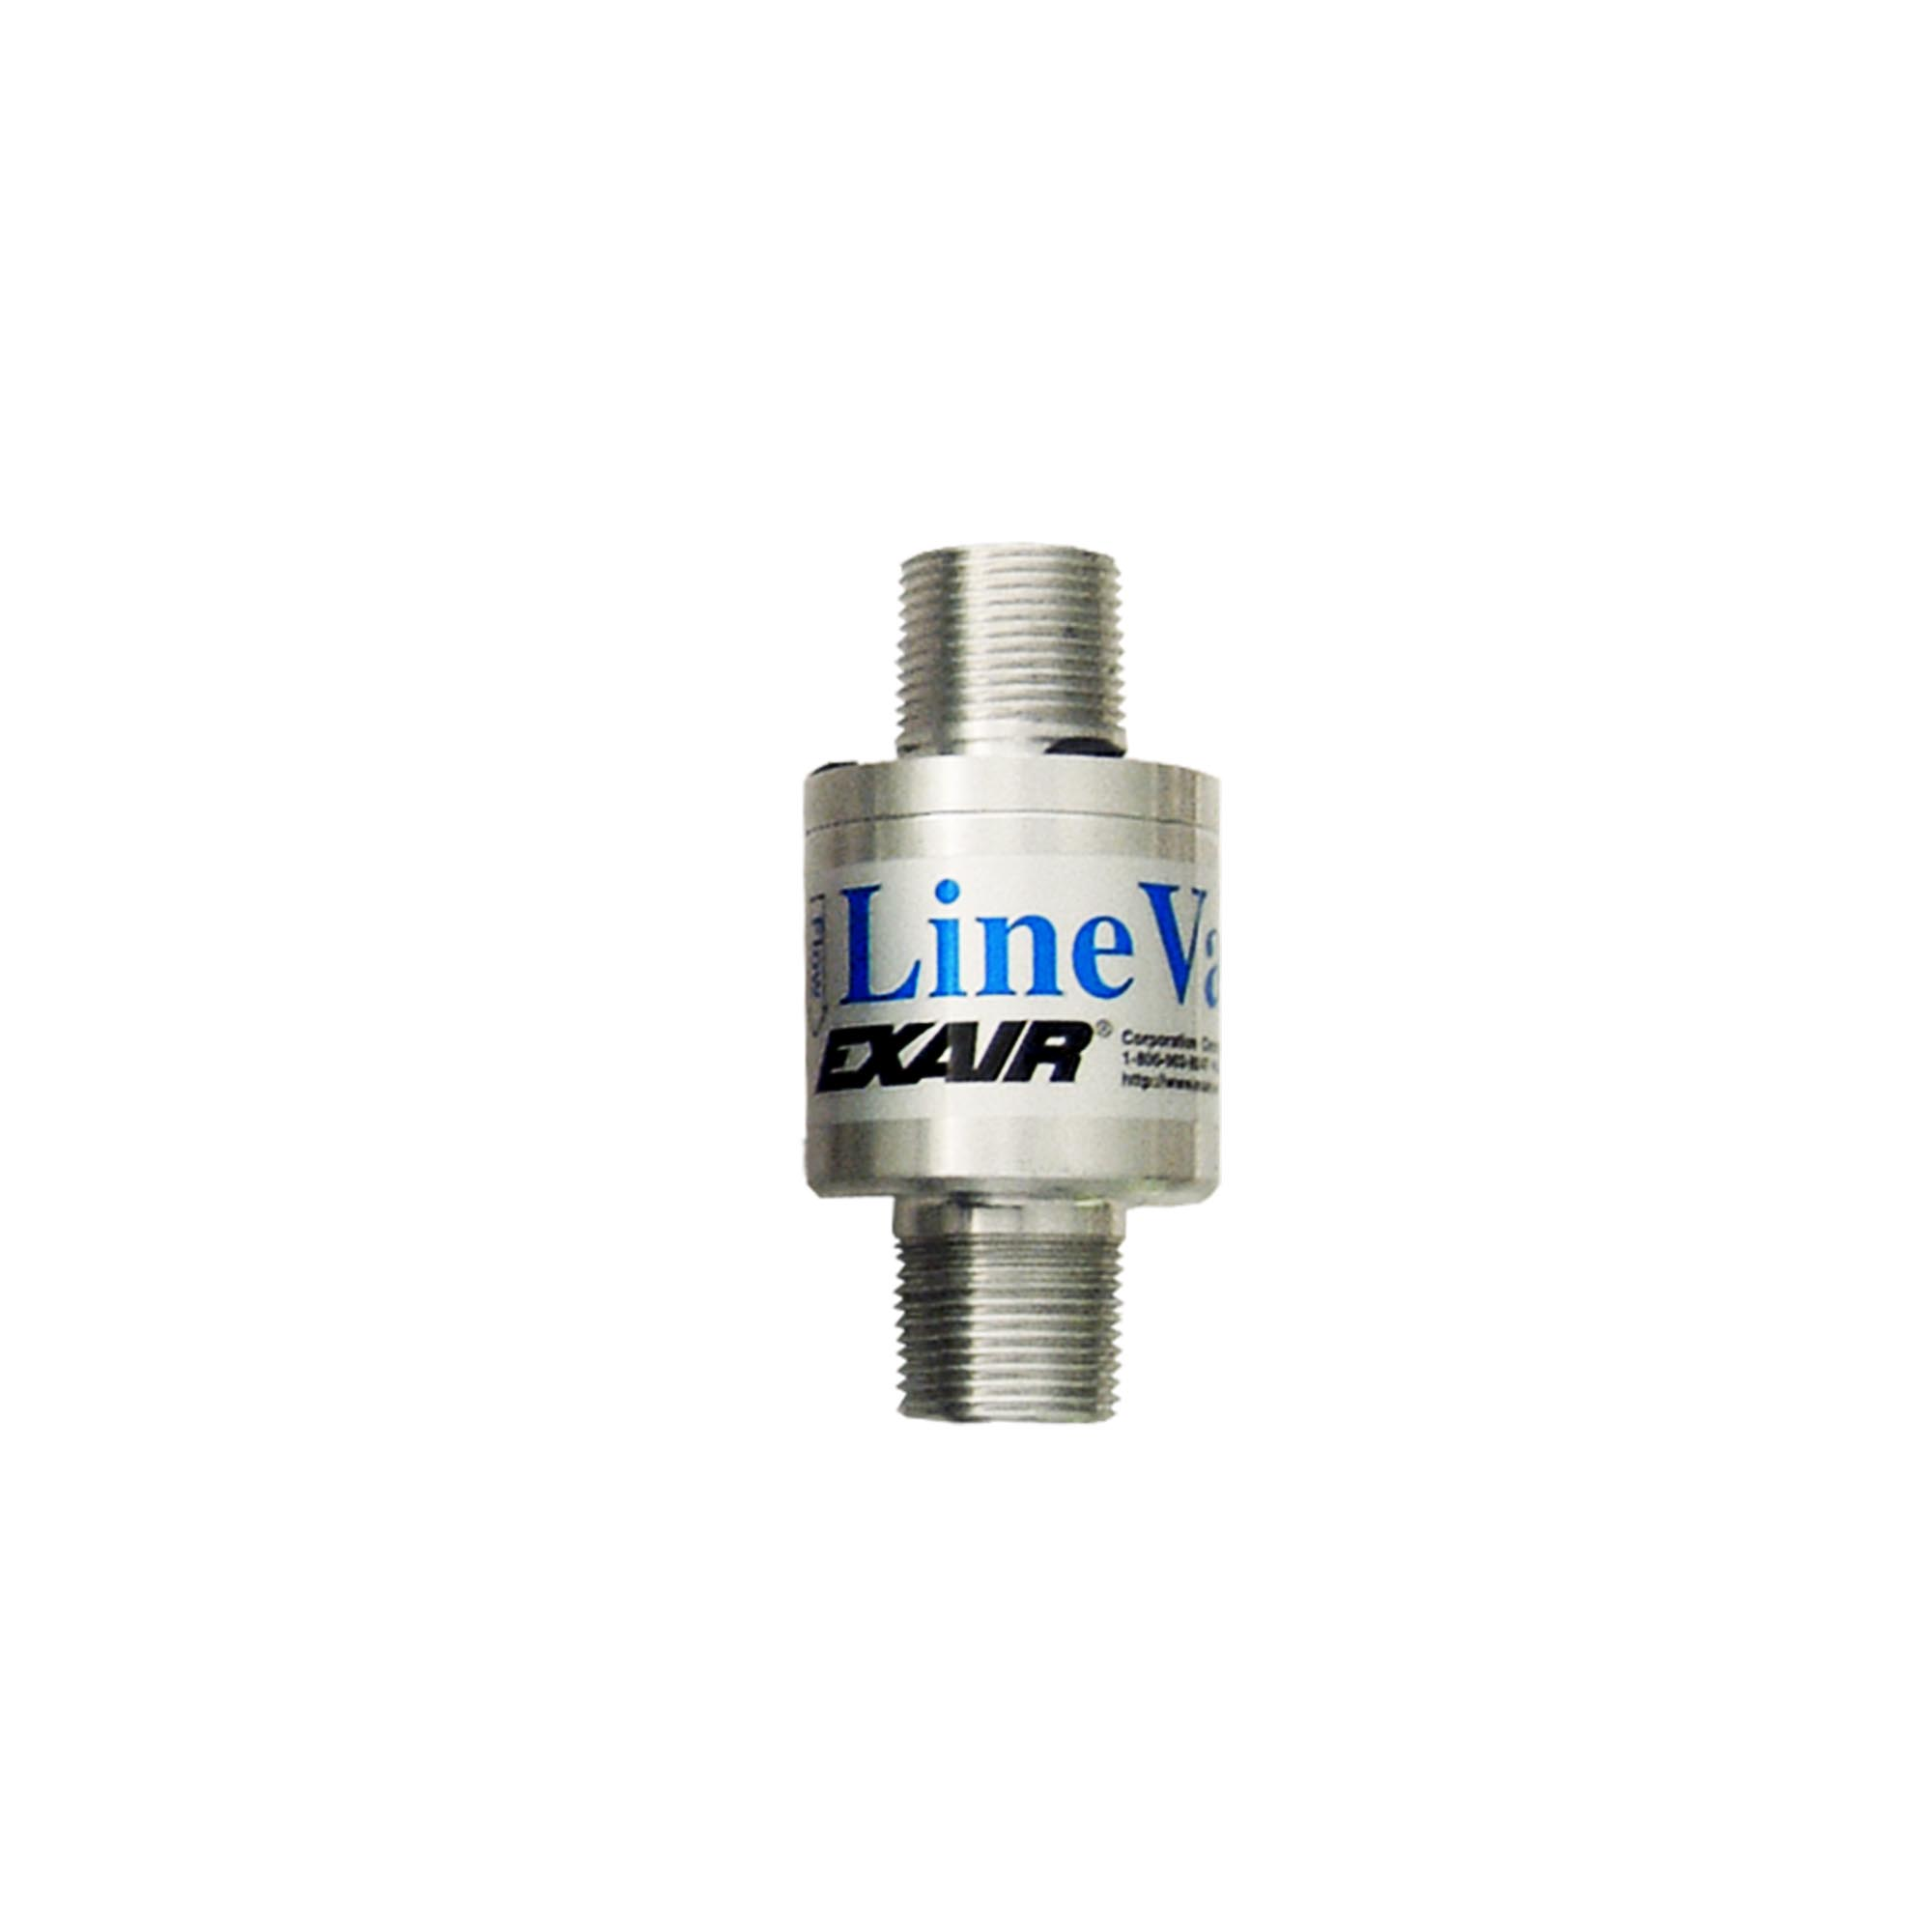 Model 140075 3/4 MNPT Threaded Line Vac